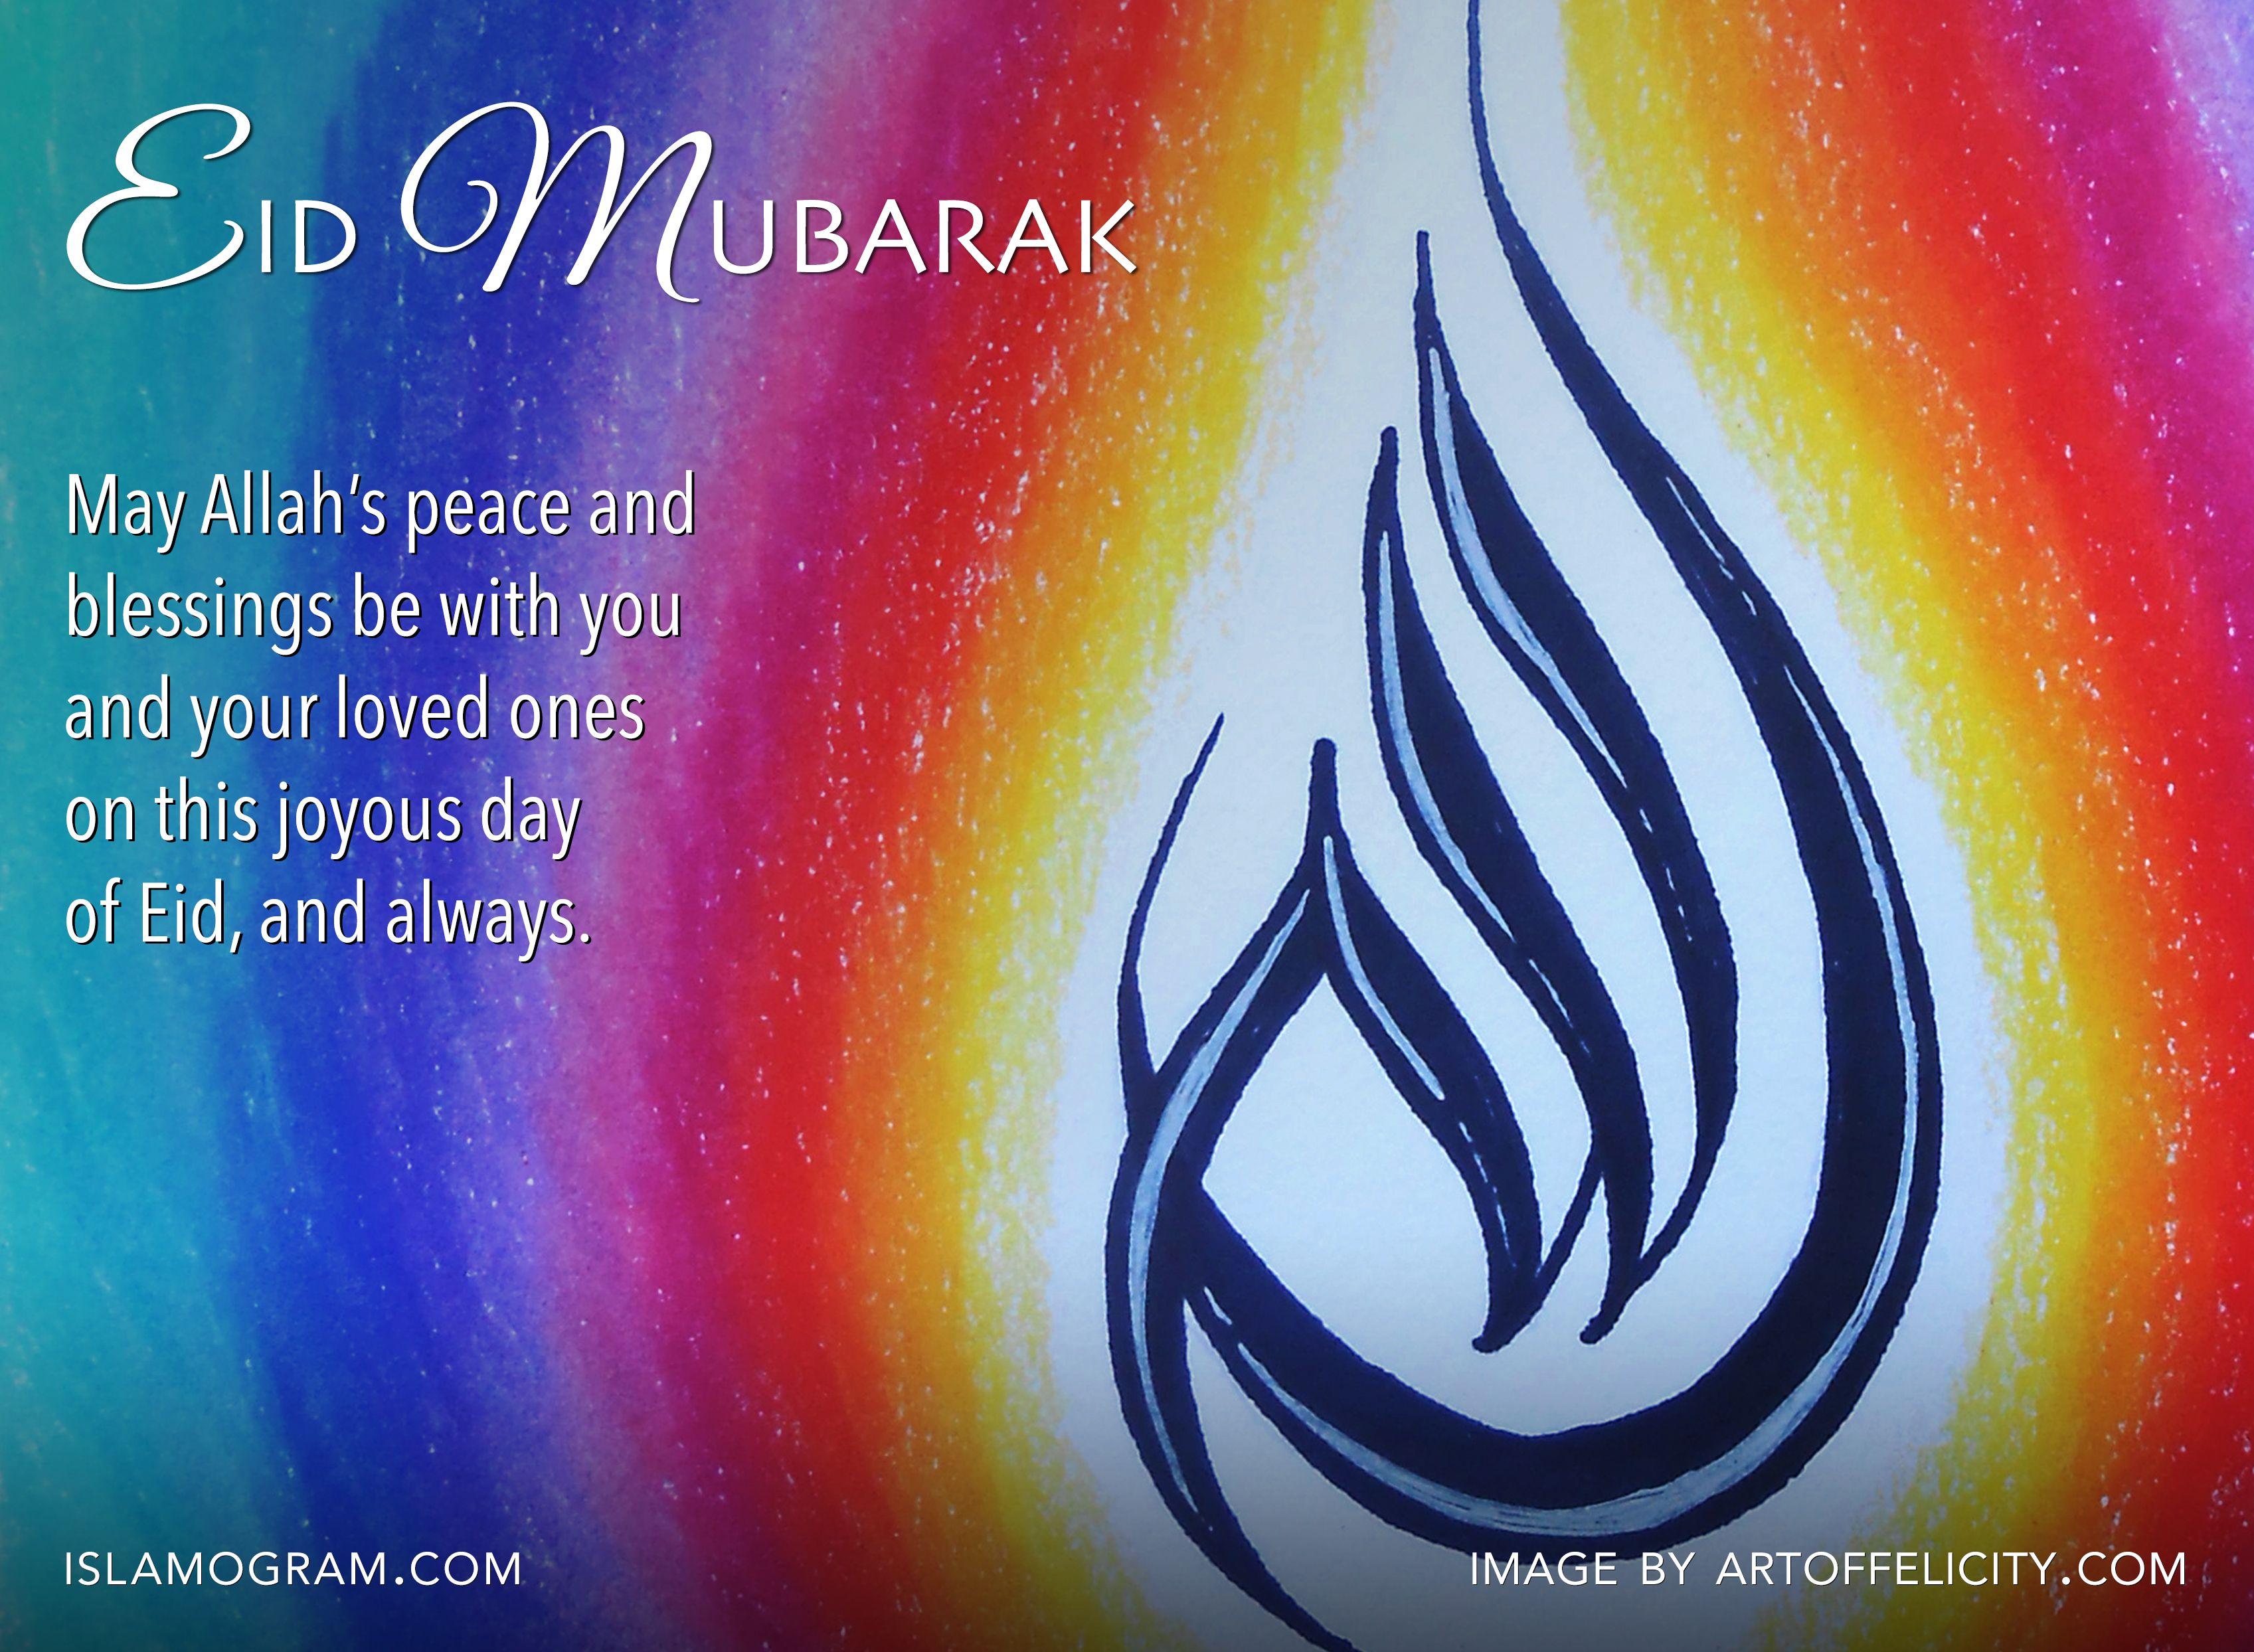 Eid Mubarak Visit Islamogram To Download Free Islamic